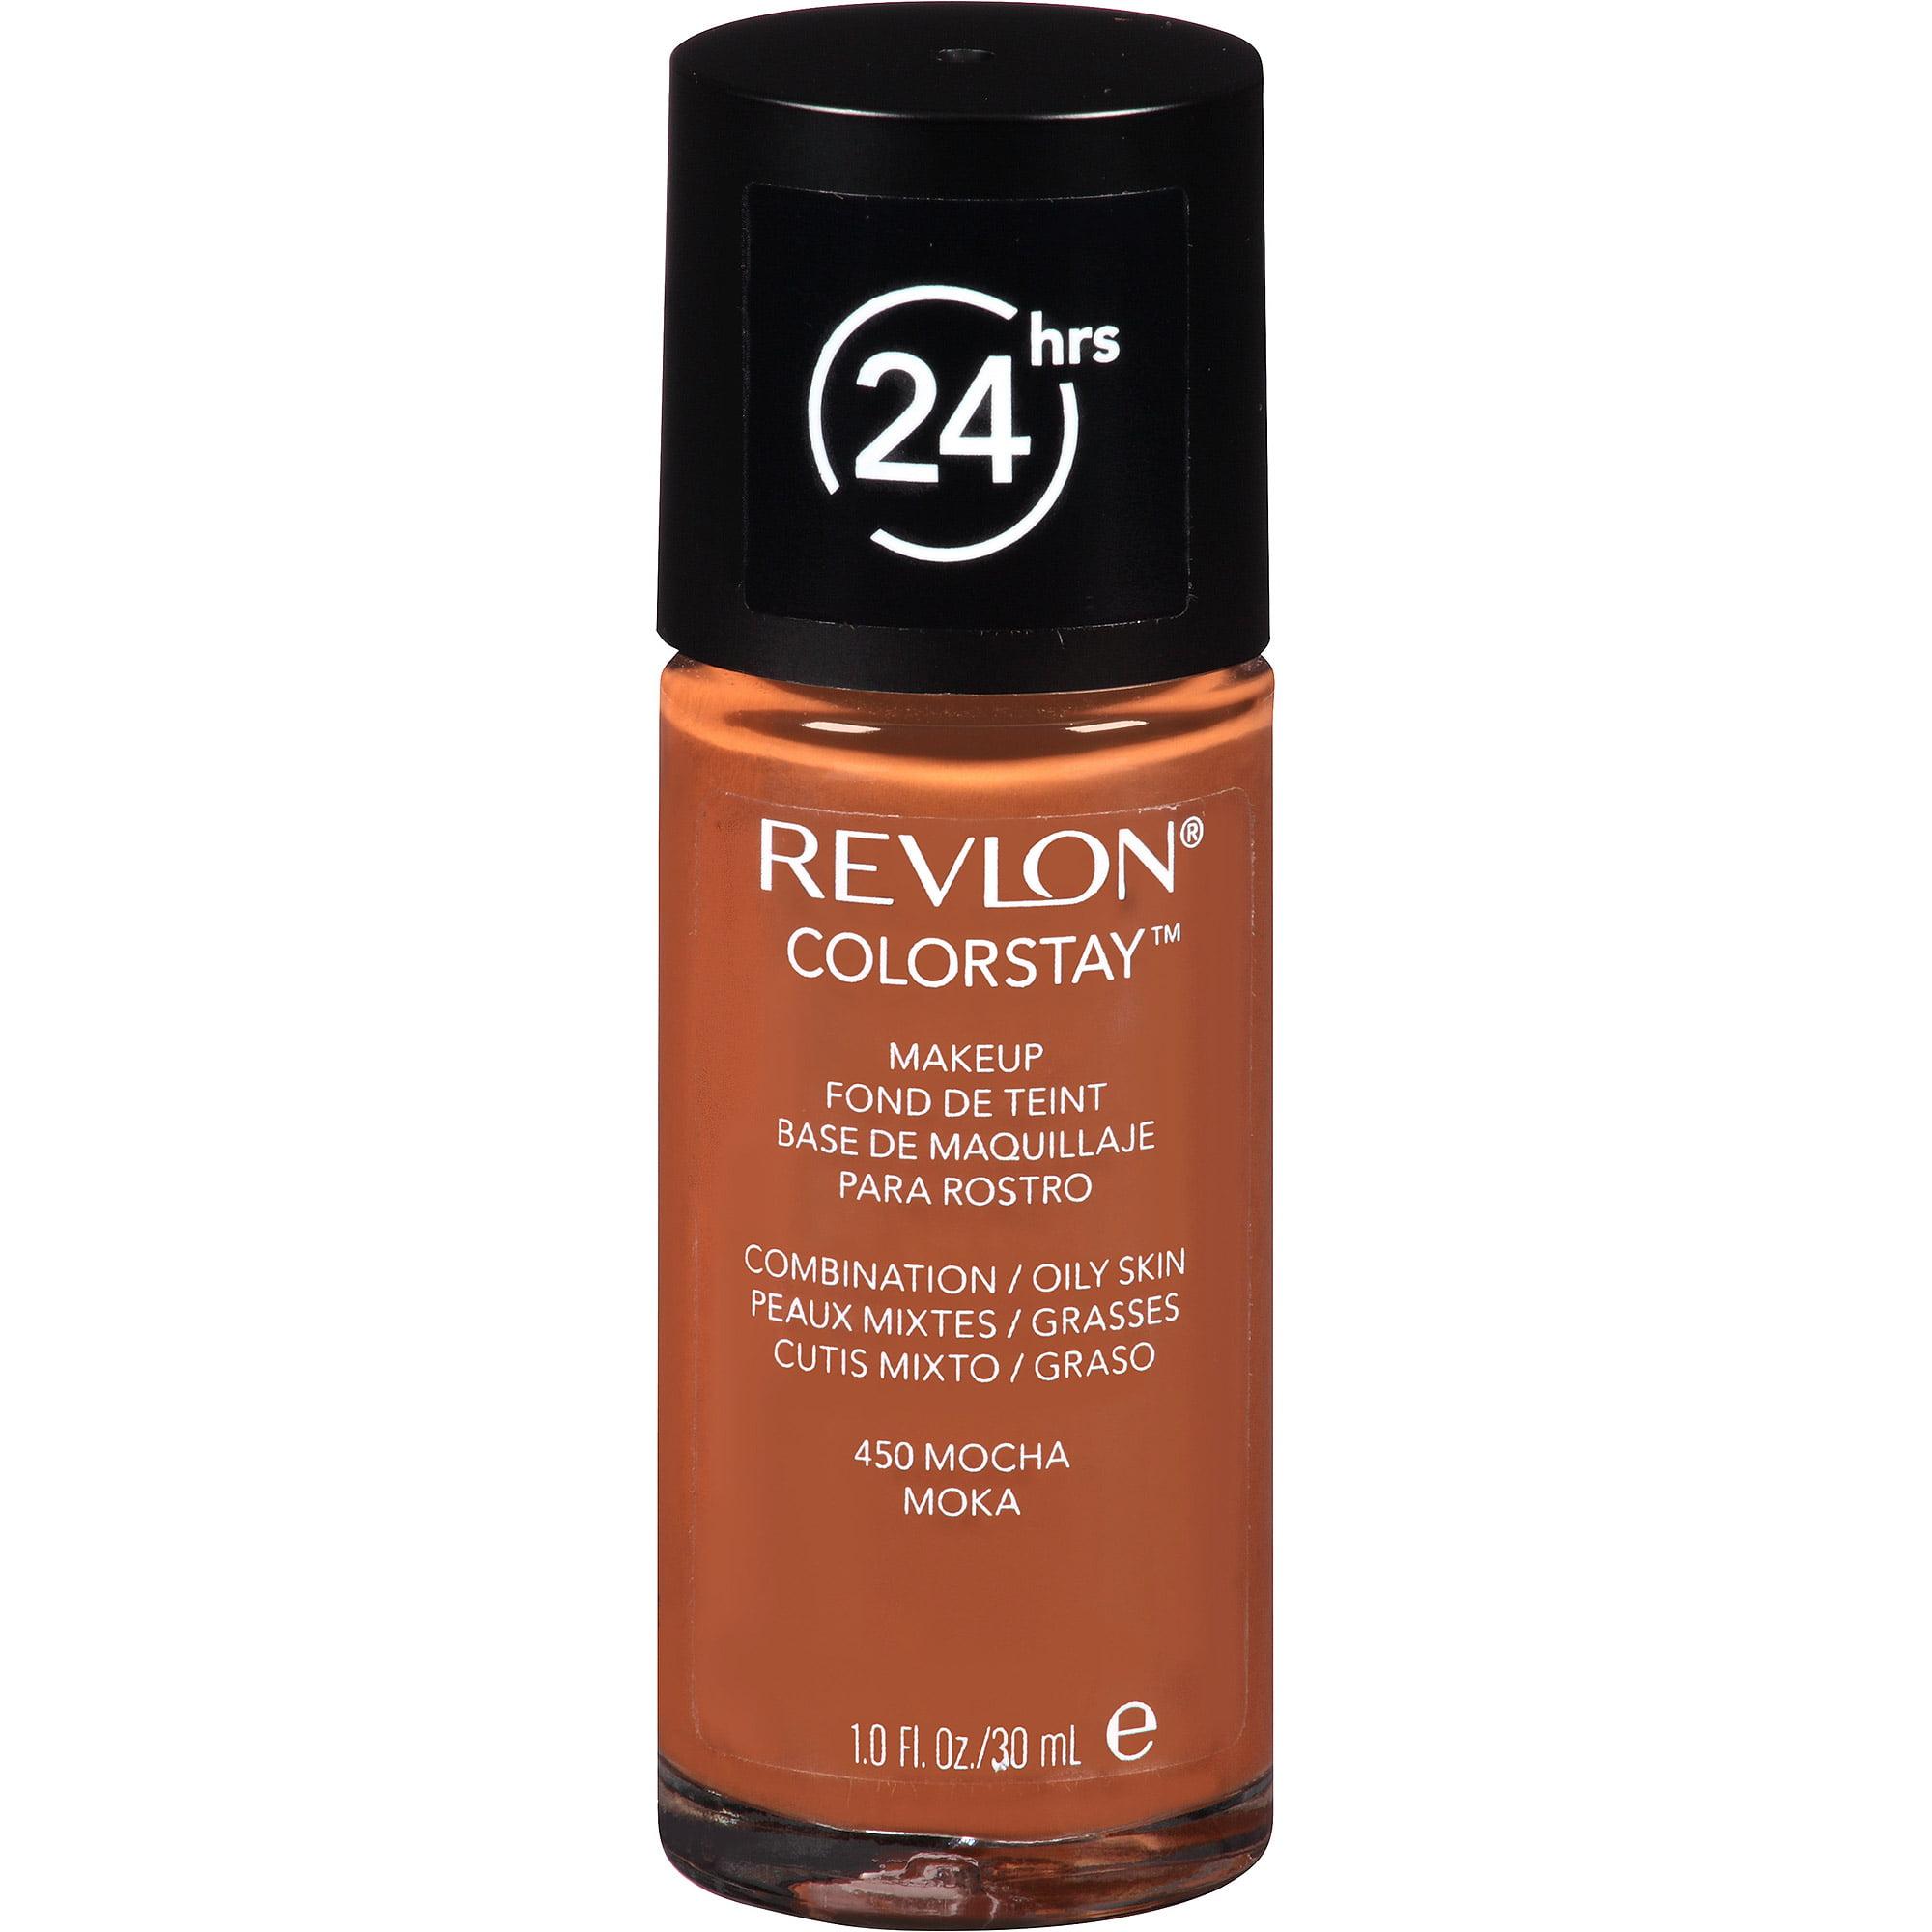 Revlon ColorStay Makeup for Combination / Oily Skin, 450 Mocha, 1 fl oz